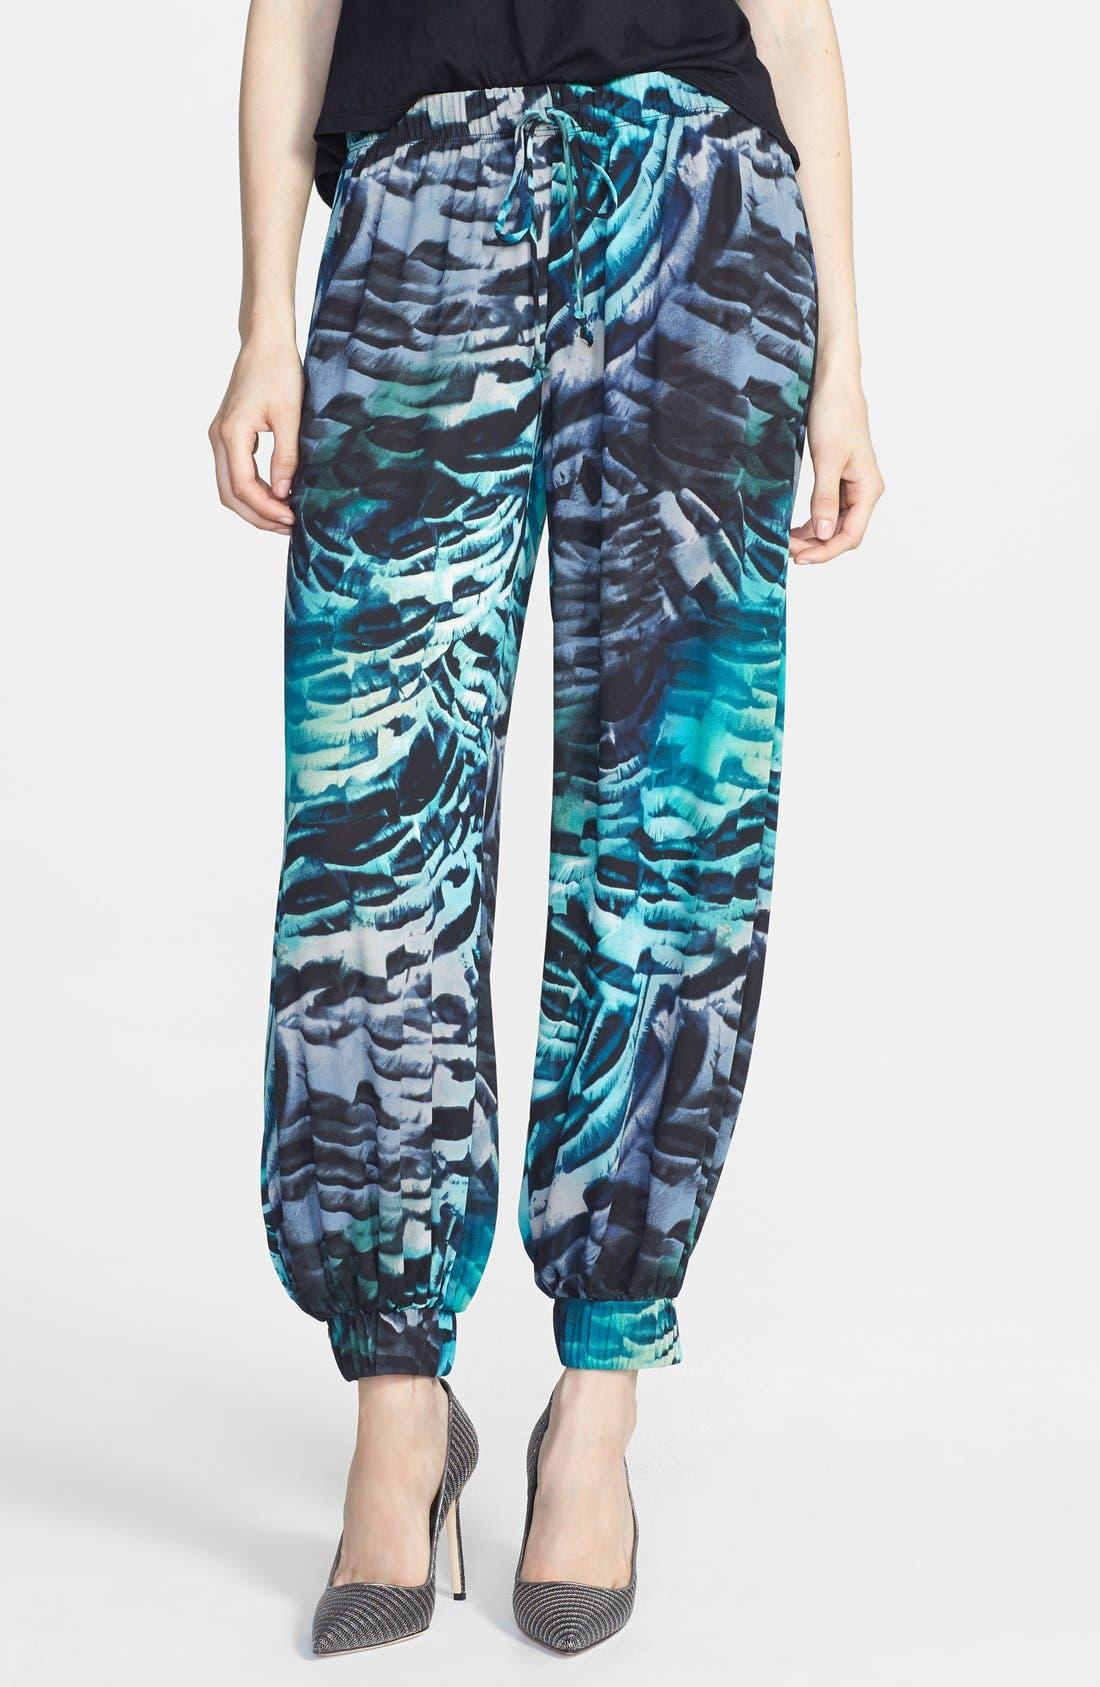 Alternate Image 1 Selected - June & Hudson Floral Genie Pants